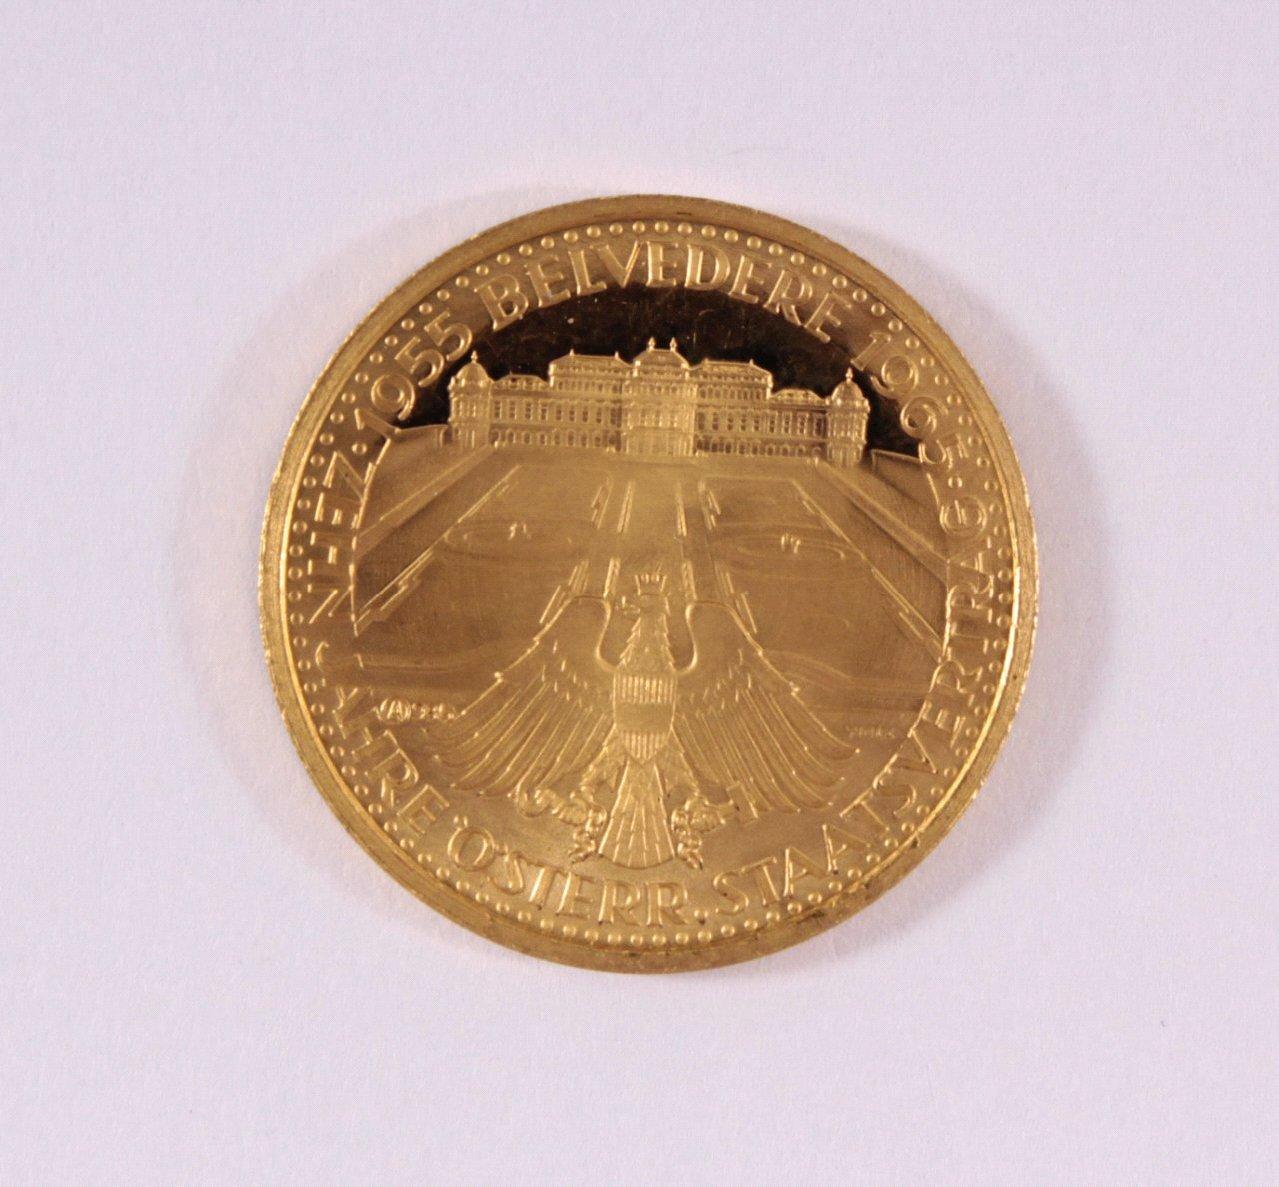 Goldmedaille 986/000 GG. 10 Jahre Österr. Staatsvertrag